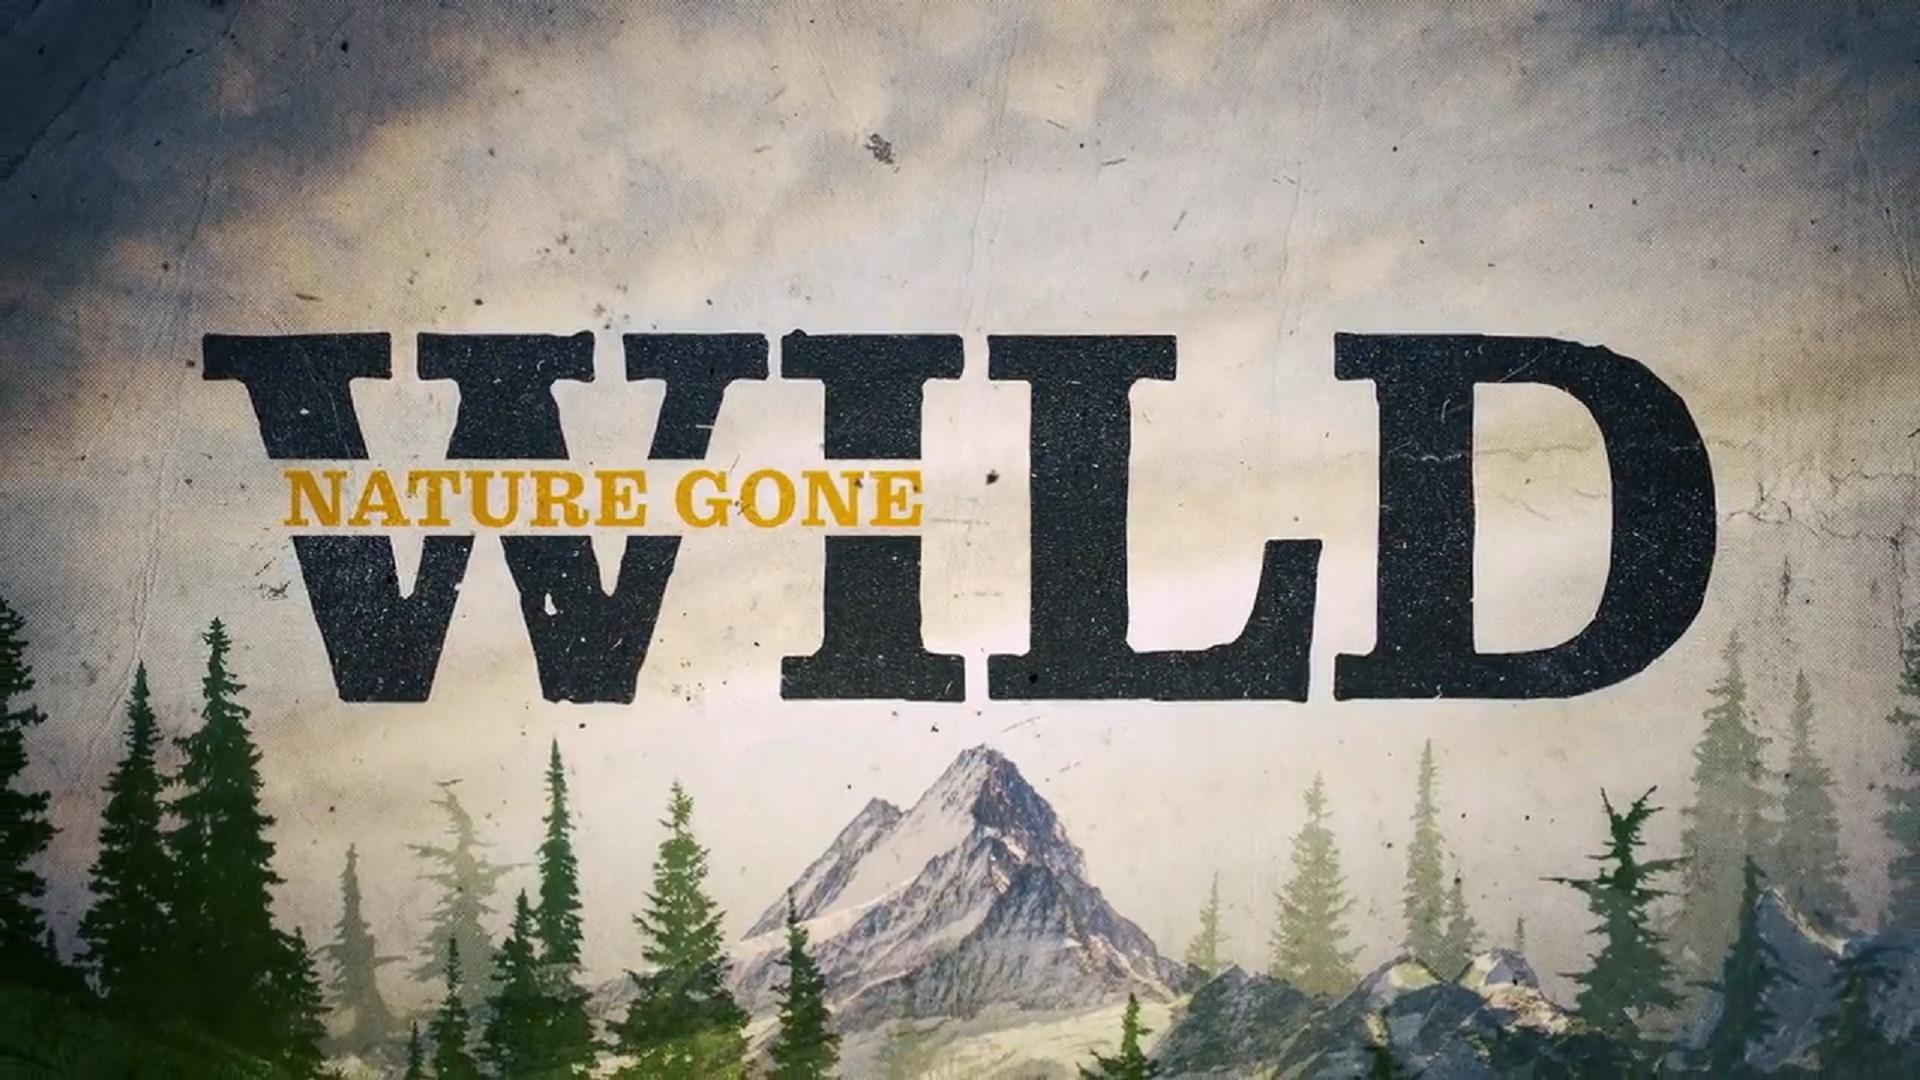 Show Nature Gone Wild